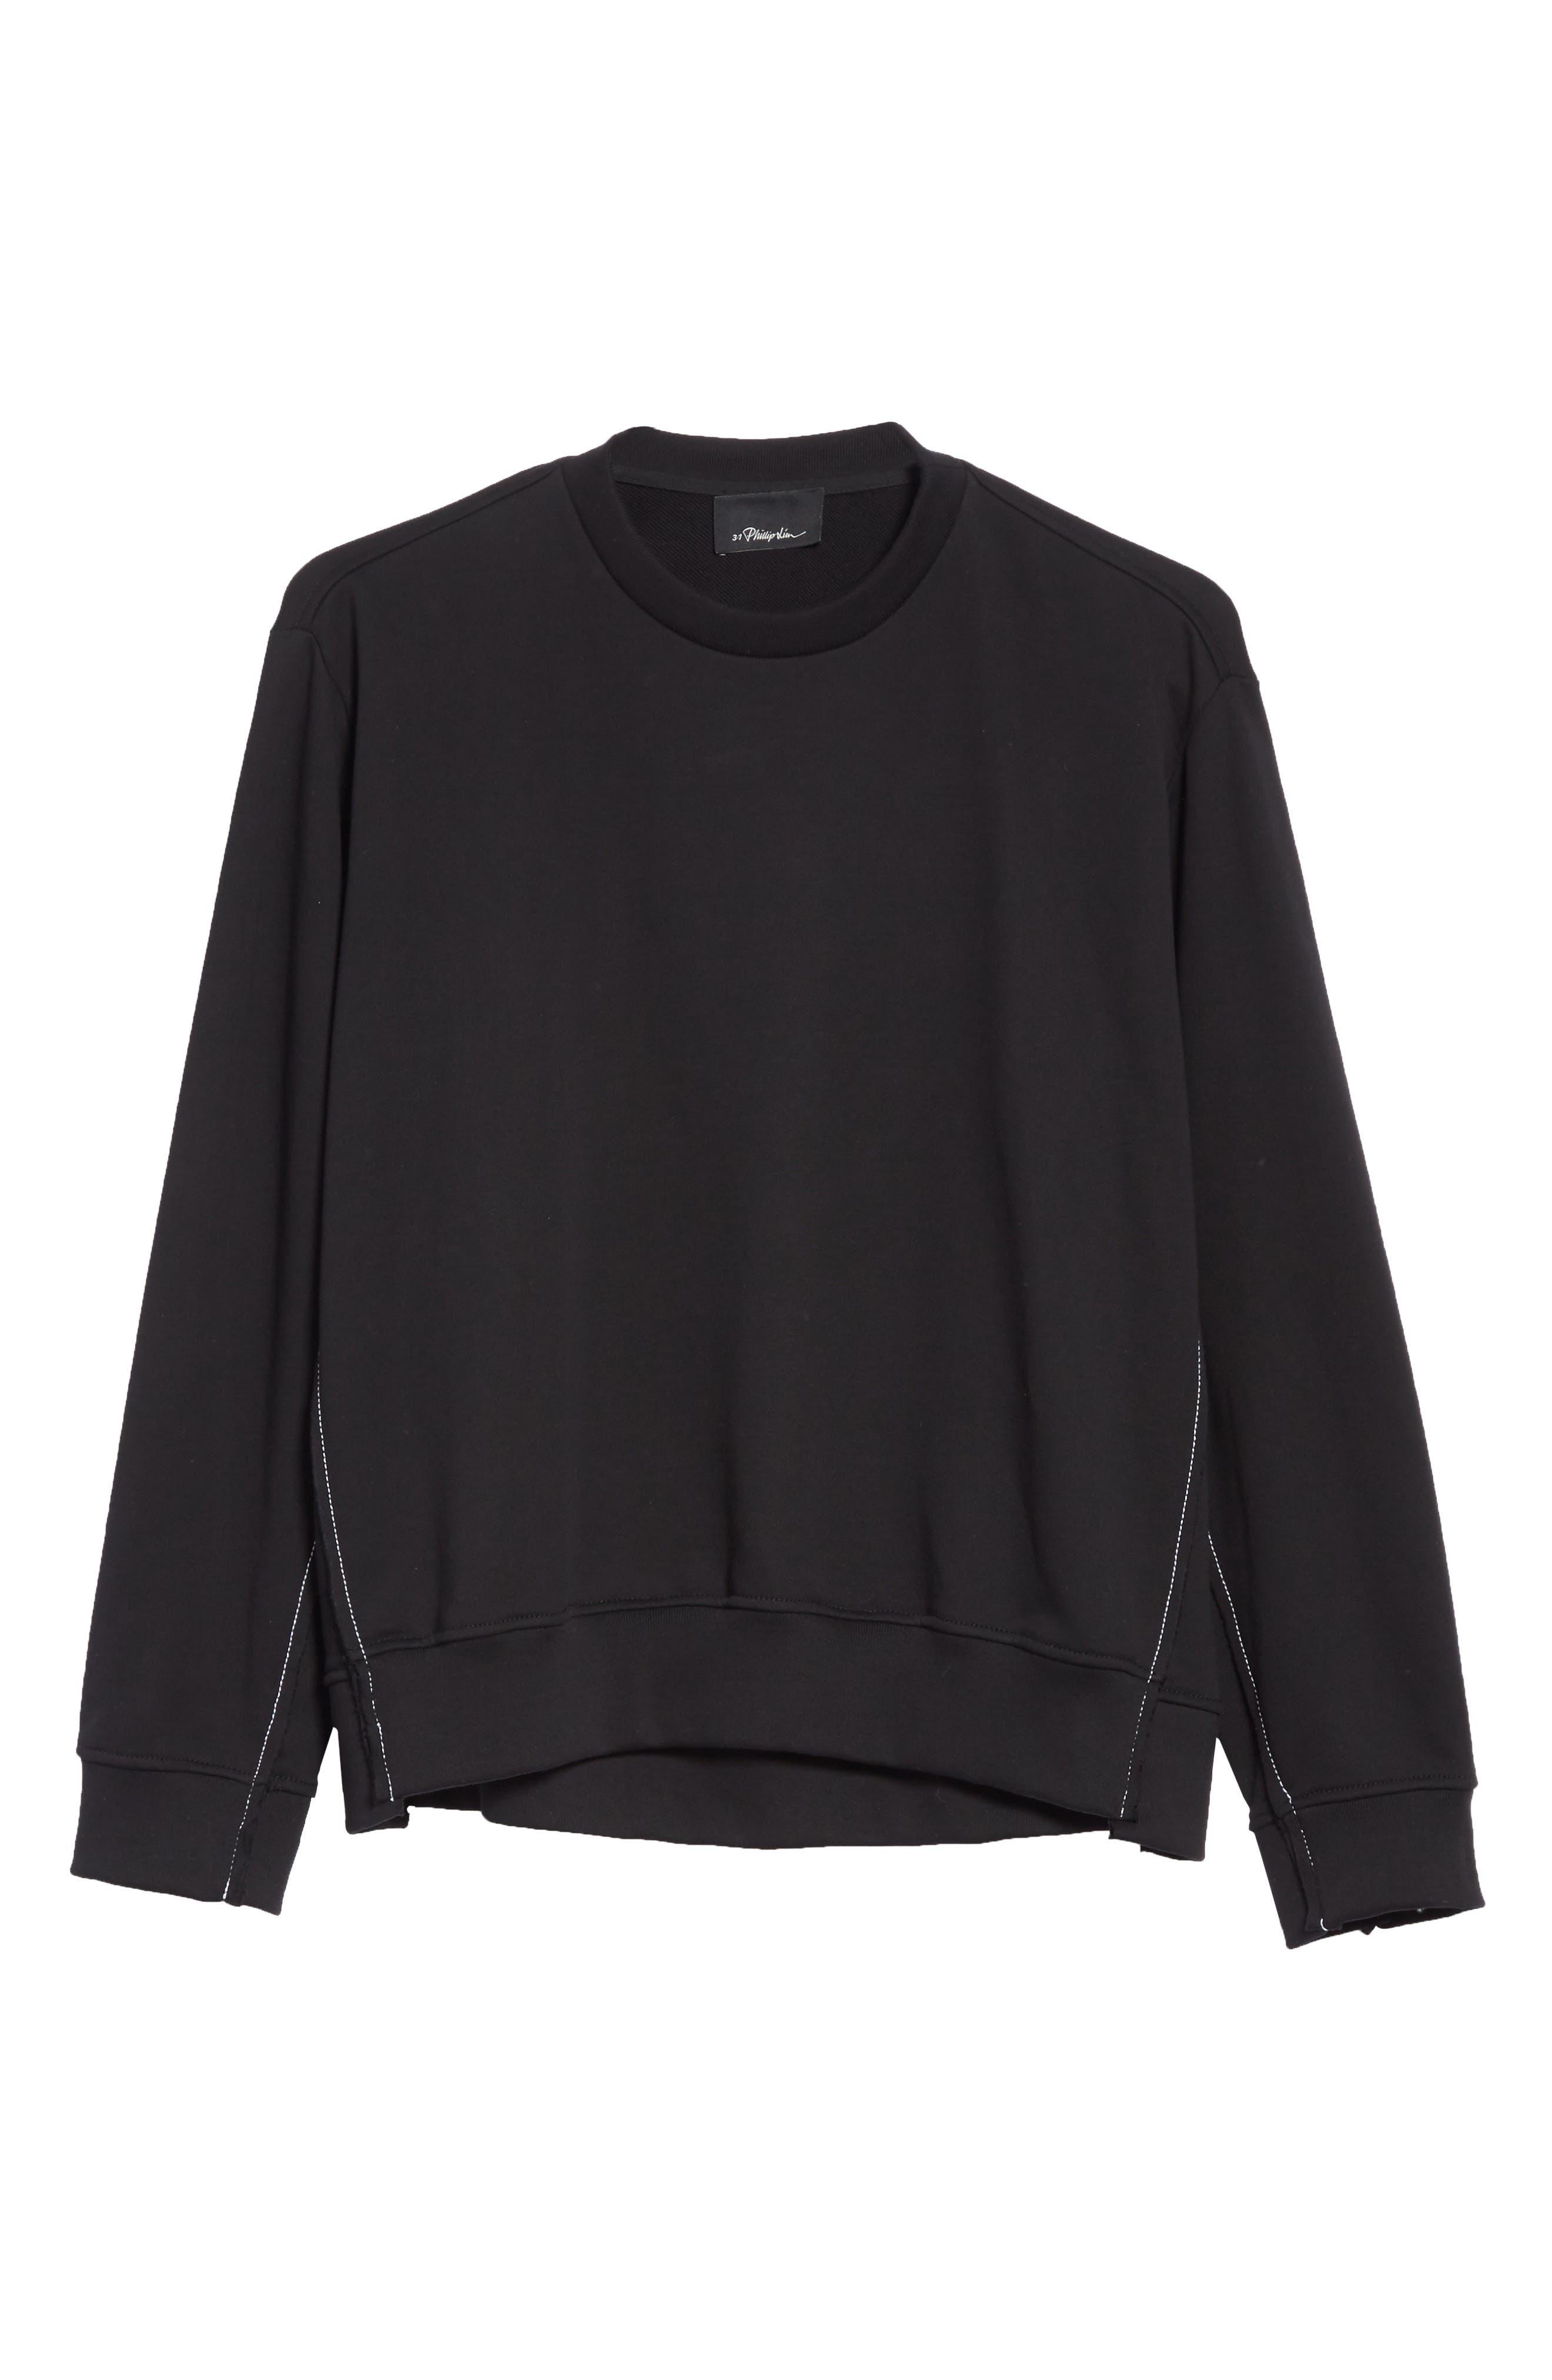 Reconstructed Crewneck Sweatshirt,                             Alternate thumbnail 6, color,                             Black